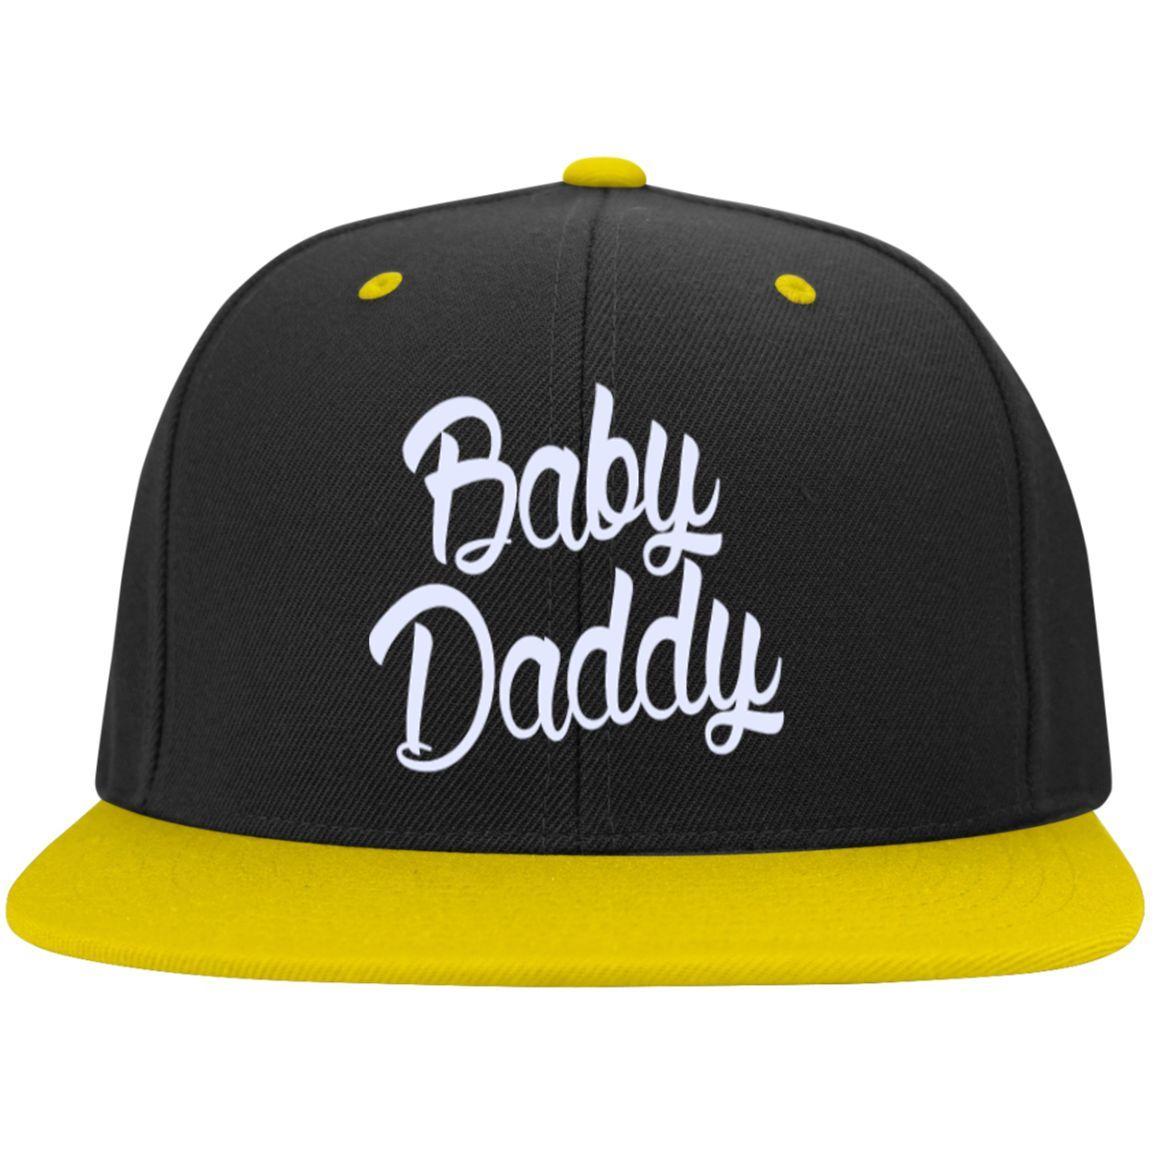 Baby Daddy | Snapback Hat